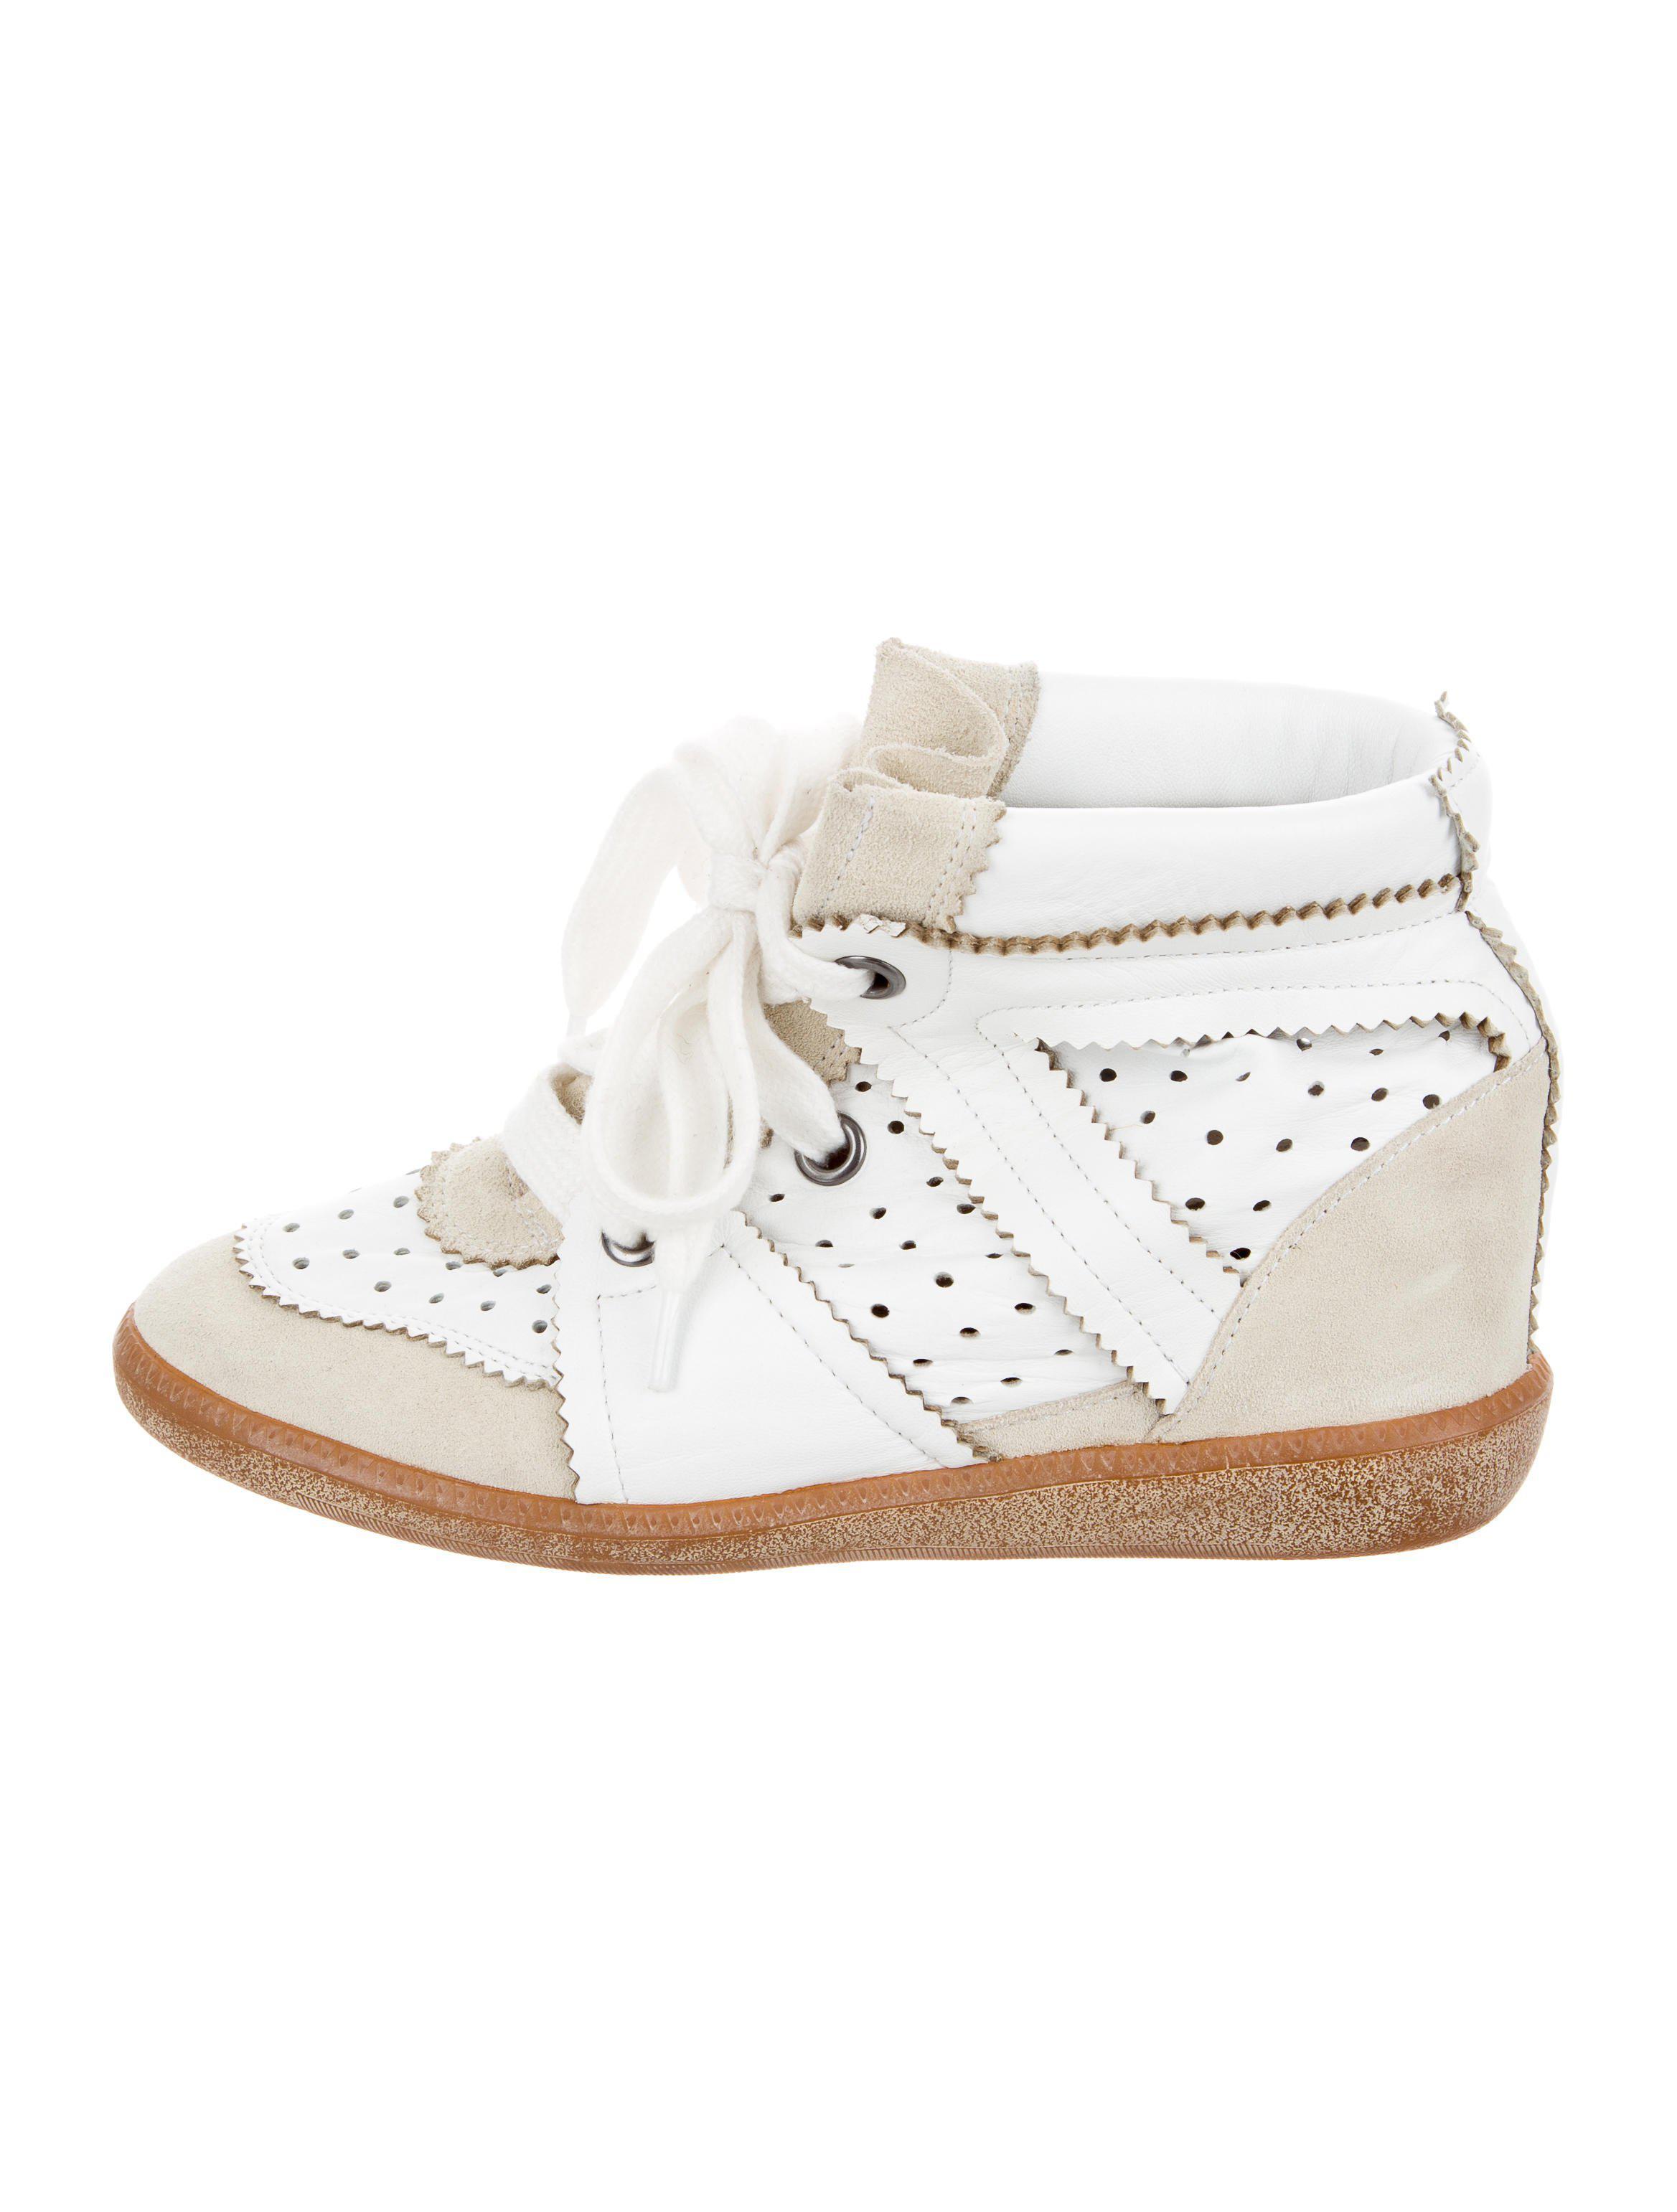 Isabel Marant Betty Beige 50 Chaussures De Sport De Cale - Blanc C0Aodb